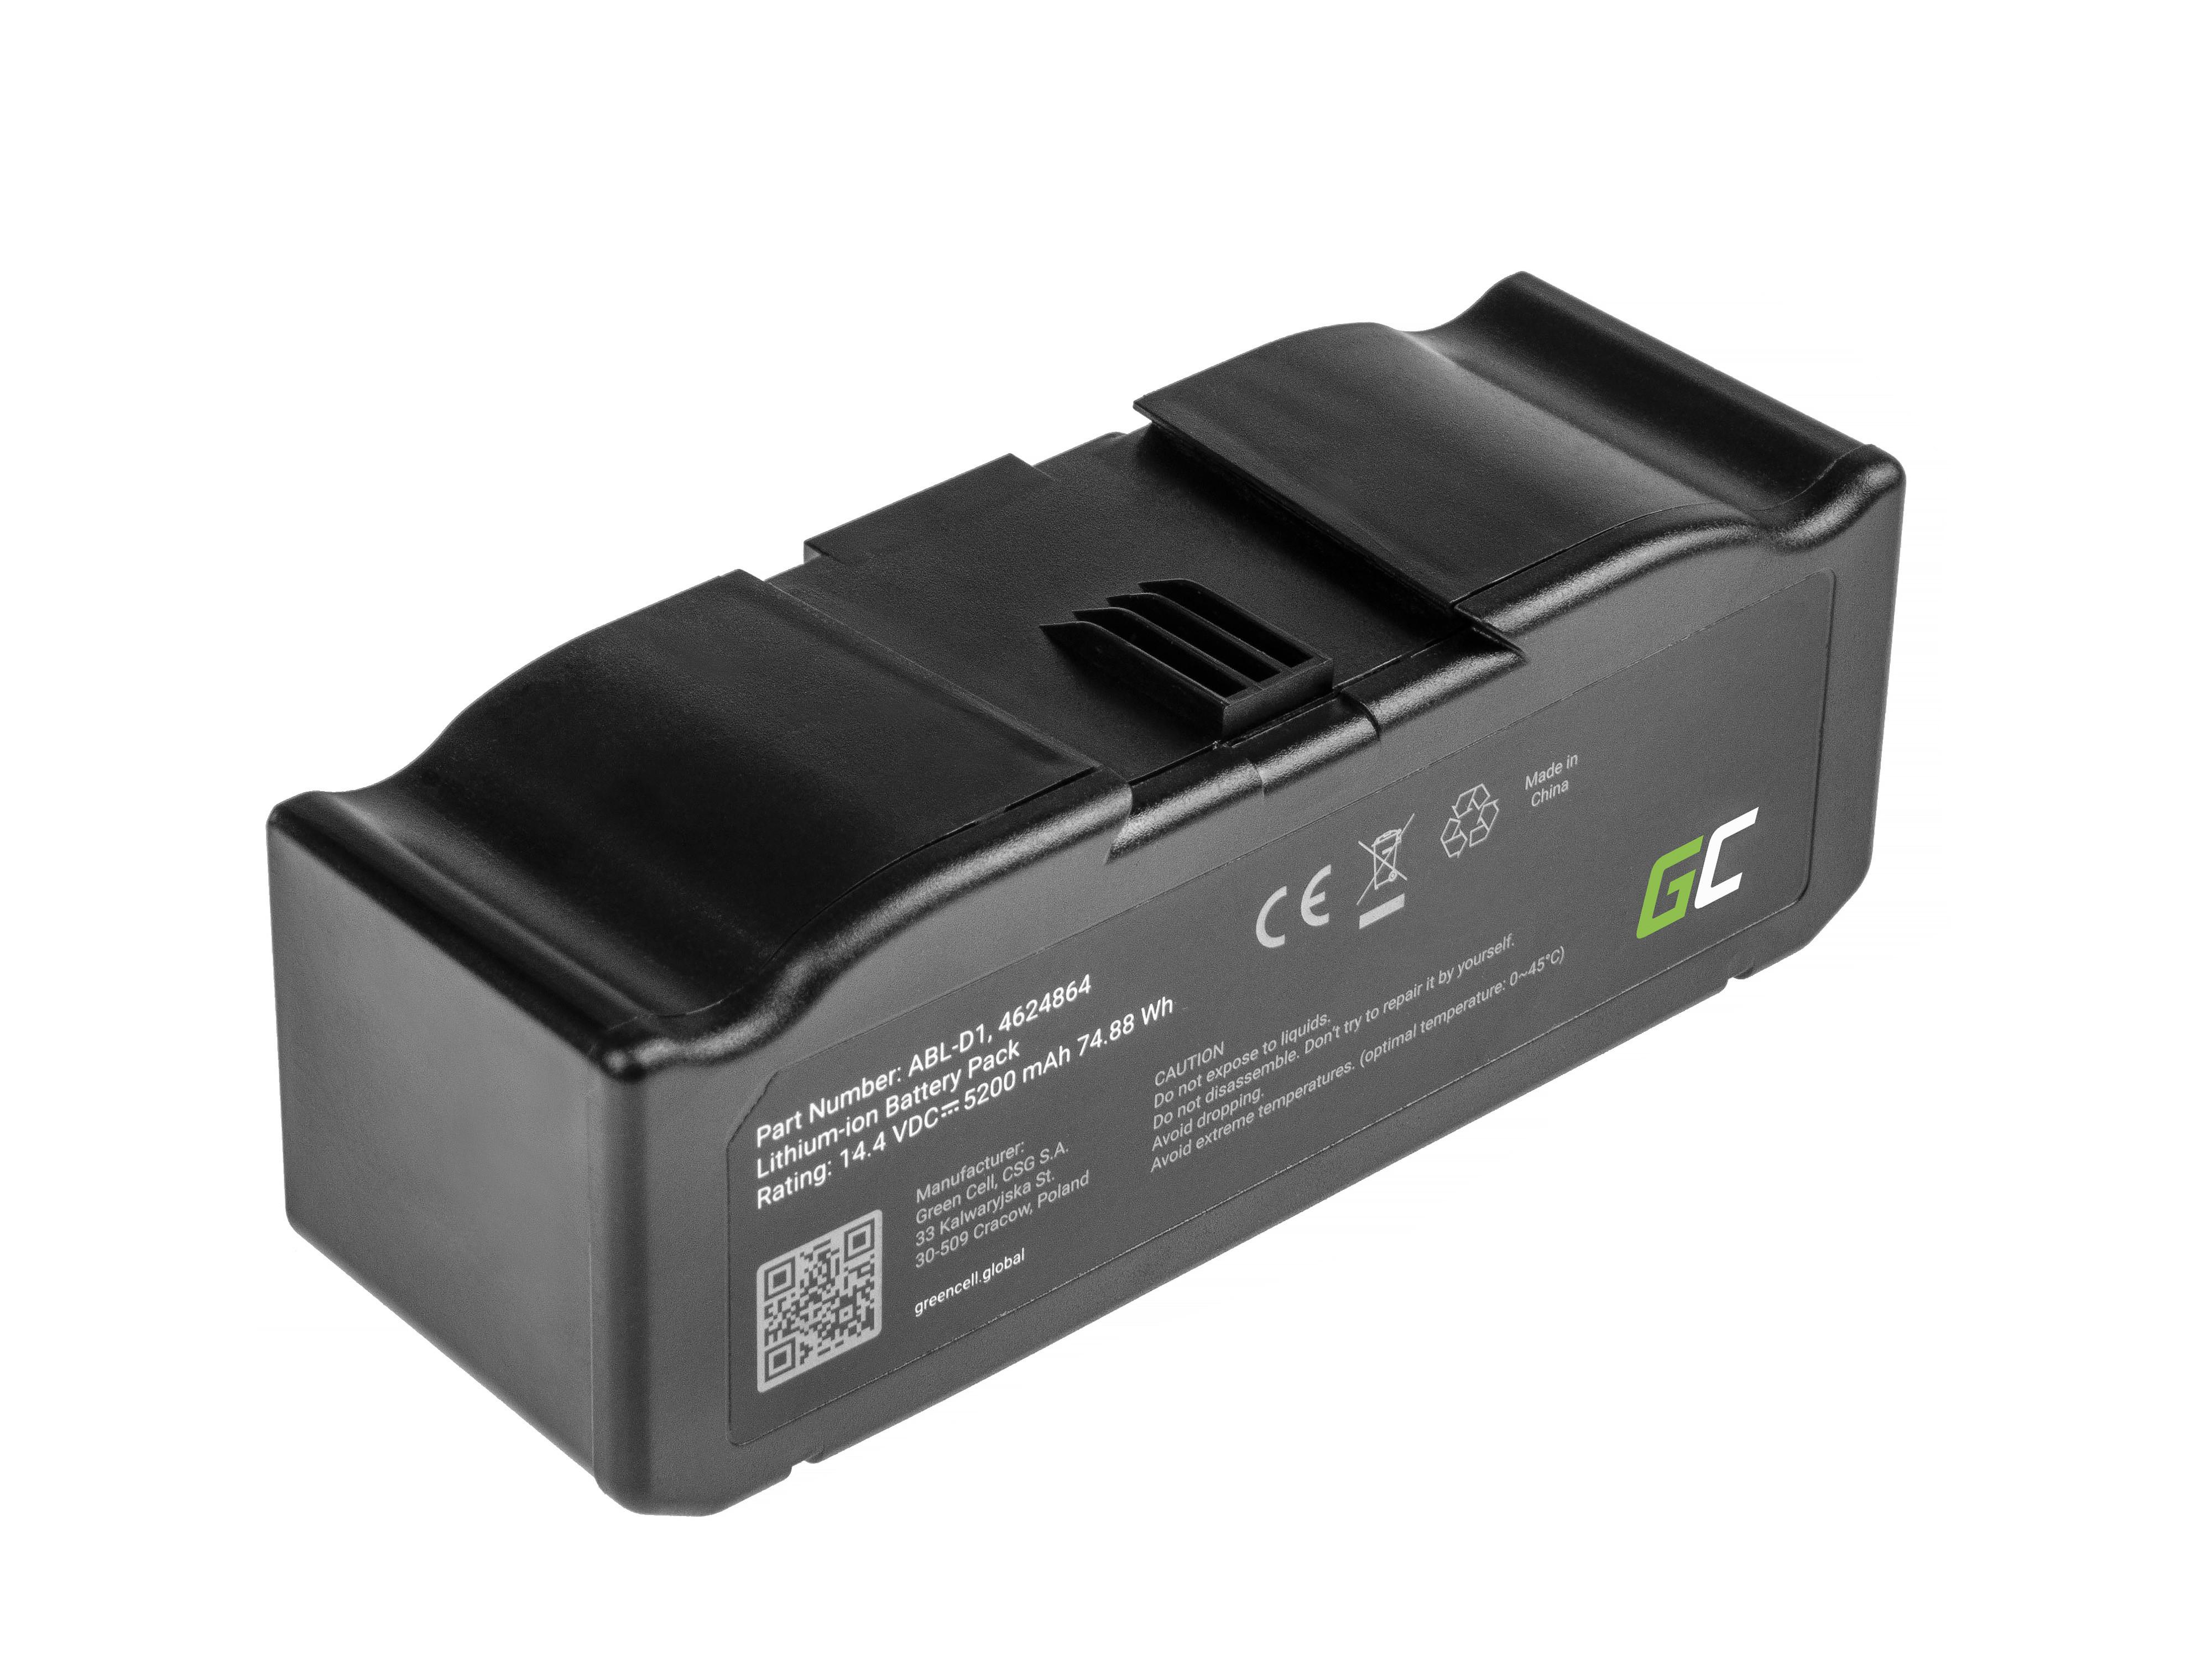 Green Cell Baterie (5.2Ah 14.4V) ABL-D1, 4624864 pro  iRobot Roomba e5, e6, i3, i3+, i7, i7+, i8, i8+